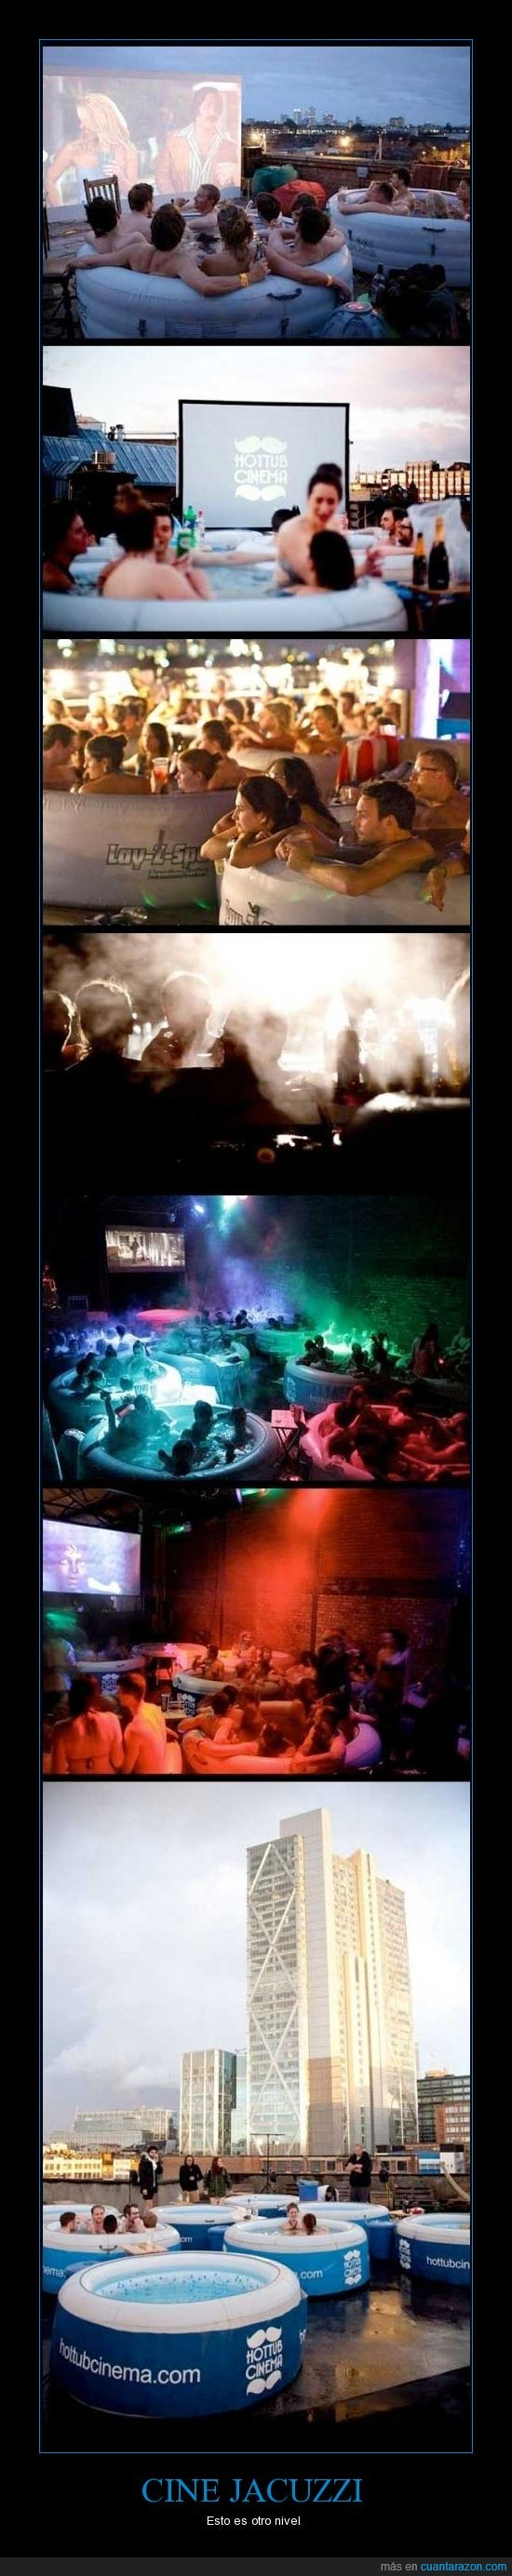 cine,espectacular,jacuzzi,peliculas,Piscinas,terraza